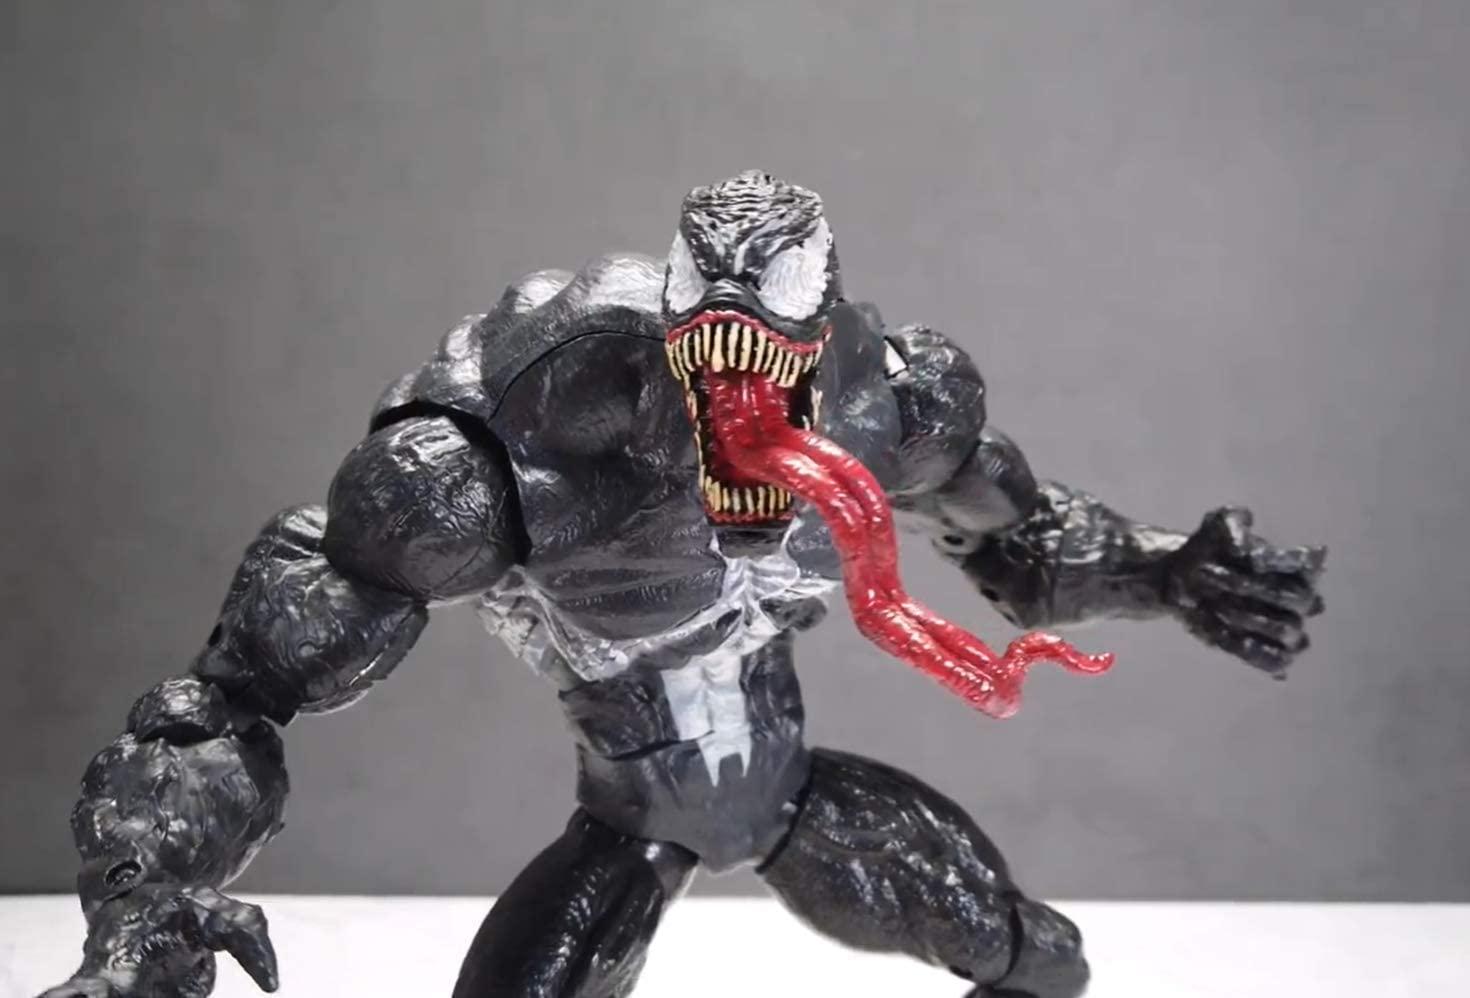 Lizars Mavel Legends Series Venom 12-inch Collectible Action Figure Venom Toy, Premium Design Joints Movable Action Figures Mavel Toys (12 inch Bag) (12 inch Bag)